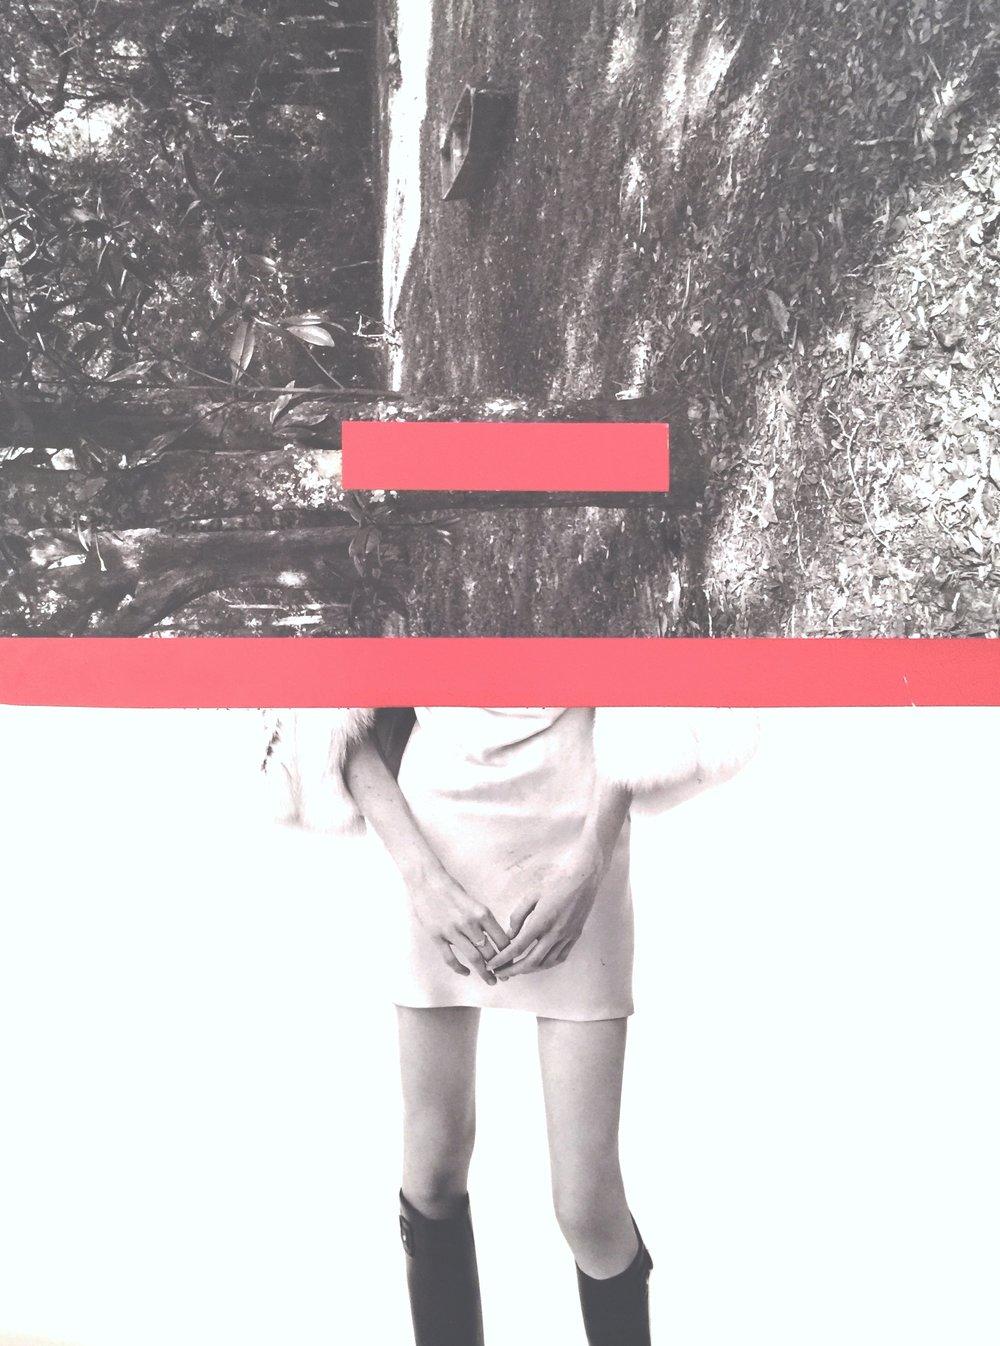 Untitled 128